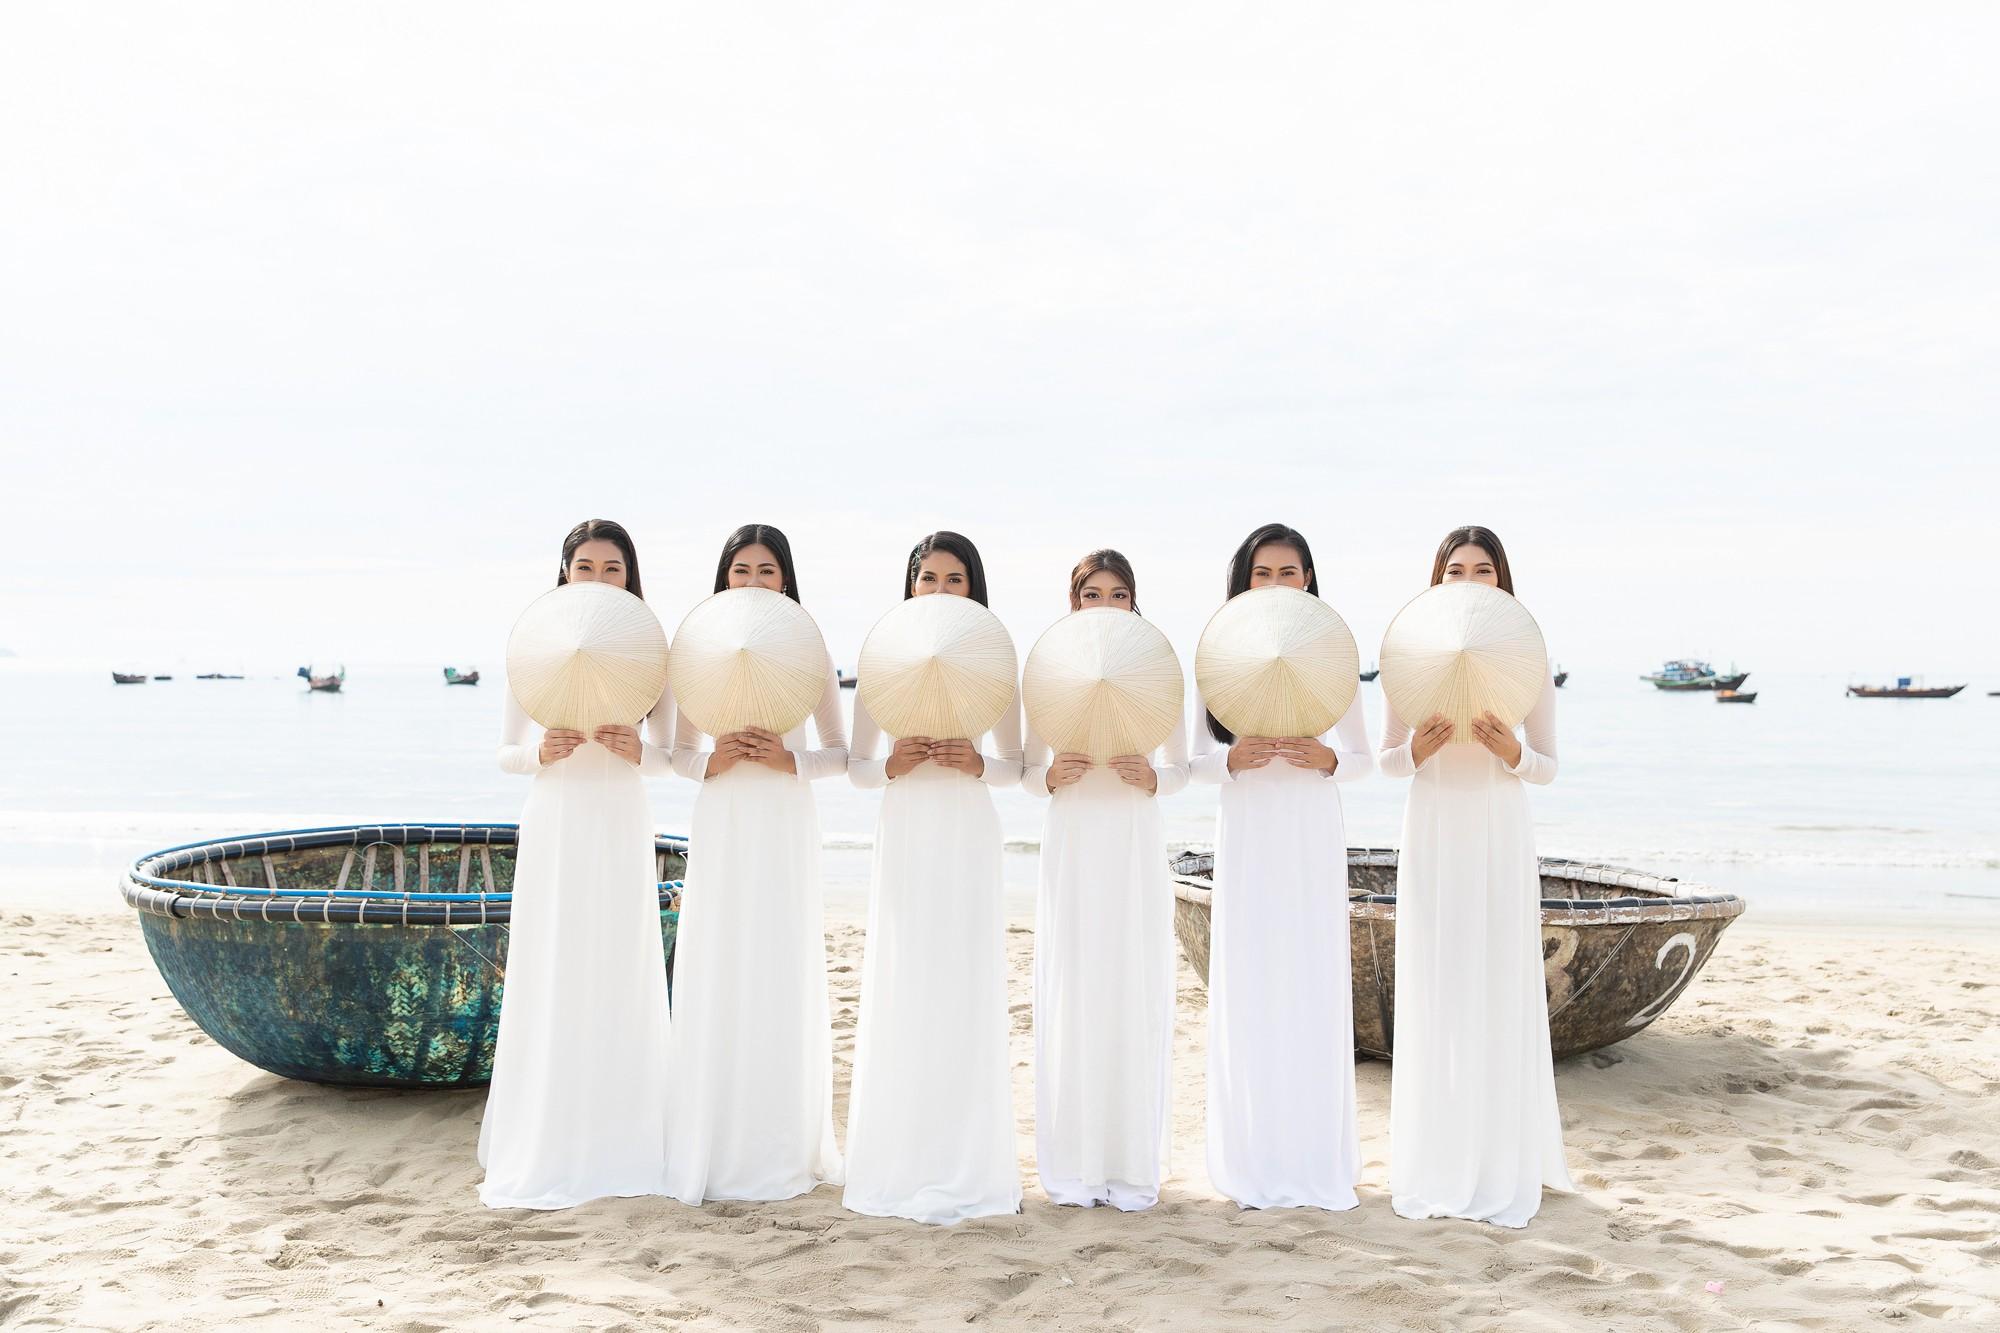 MISS WORLD VIỆT NAM 2019 (5)